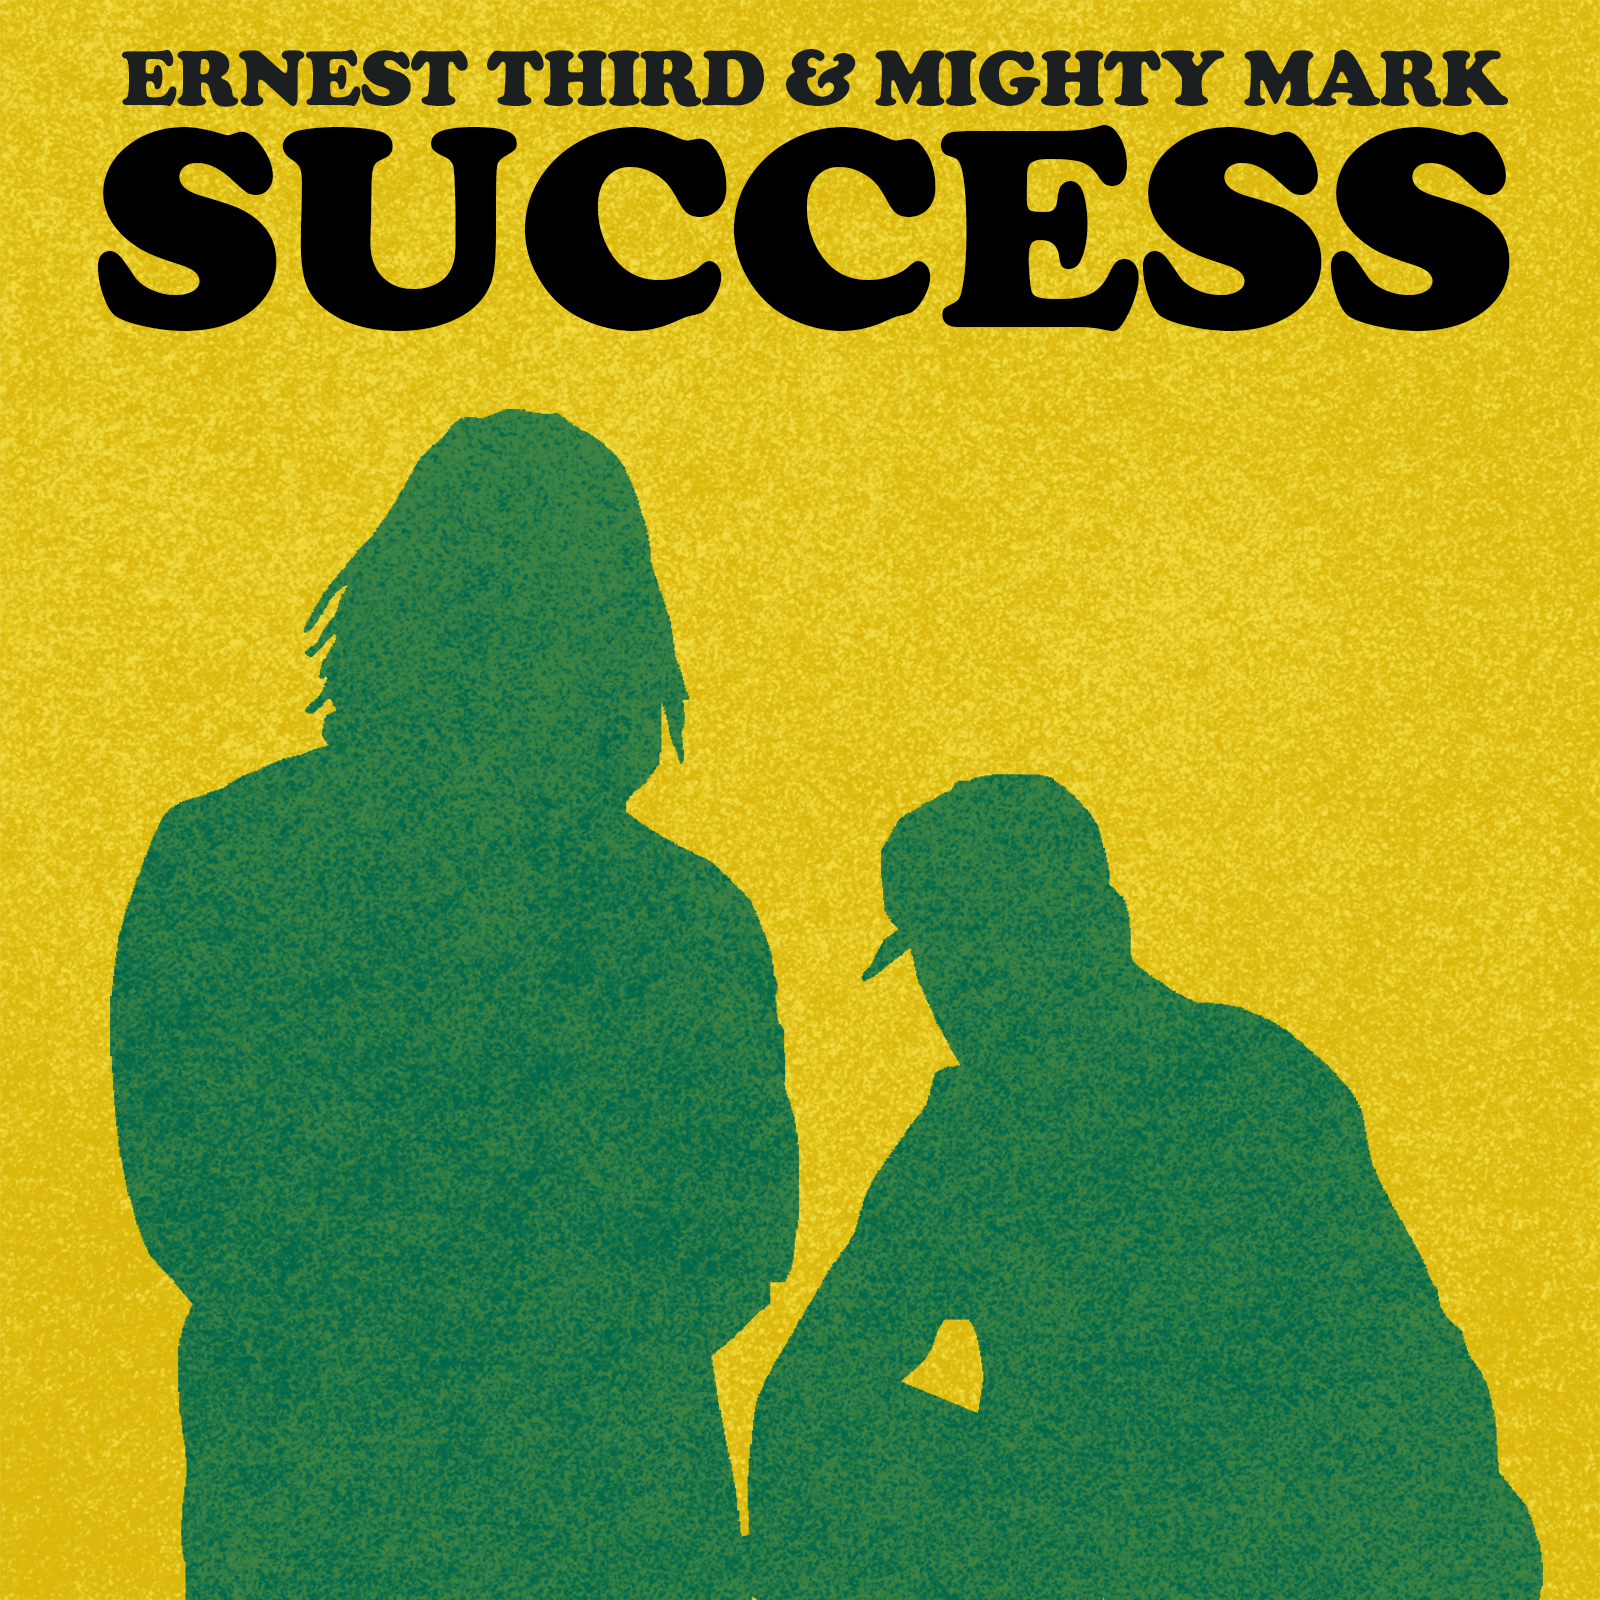 Ernest Third & Mighty Mark - Success(Cover Art).jpg